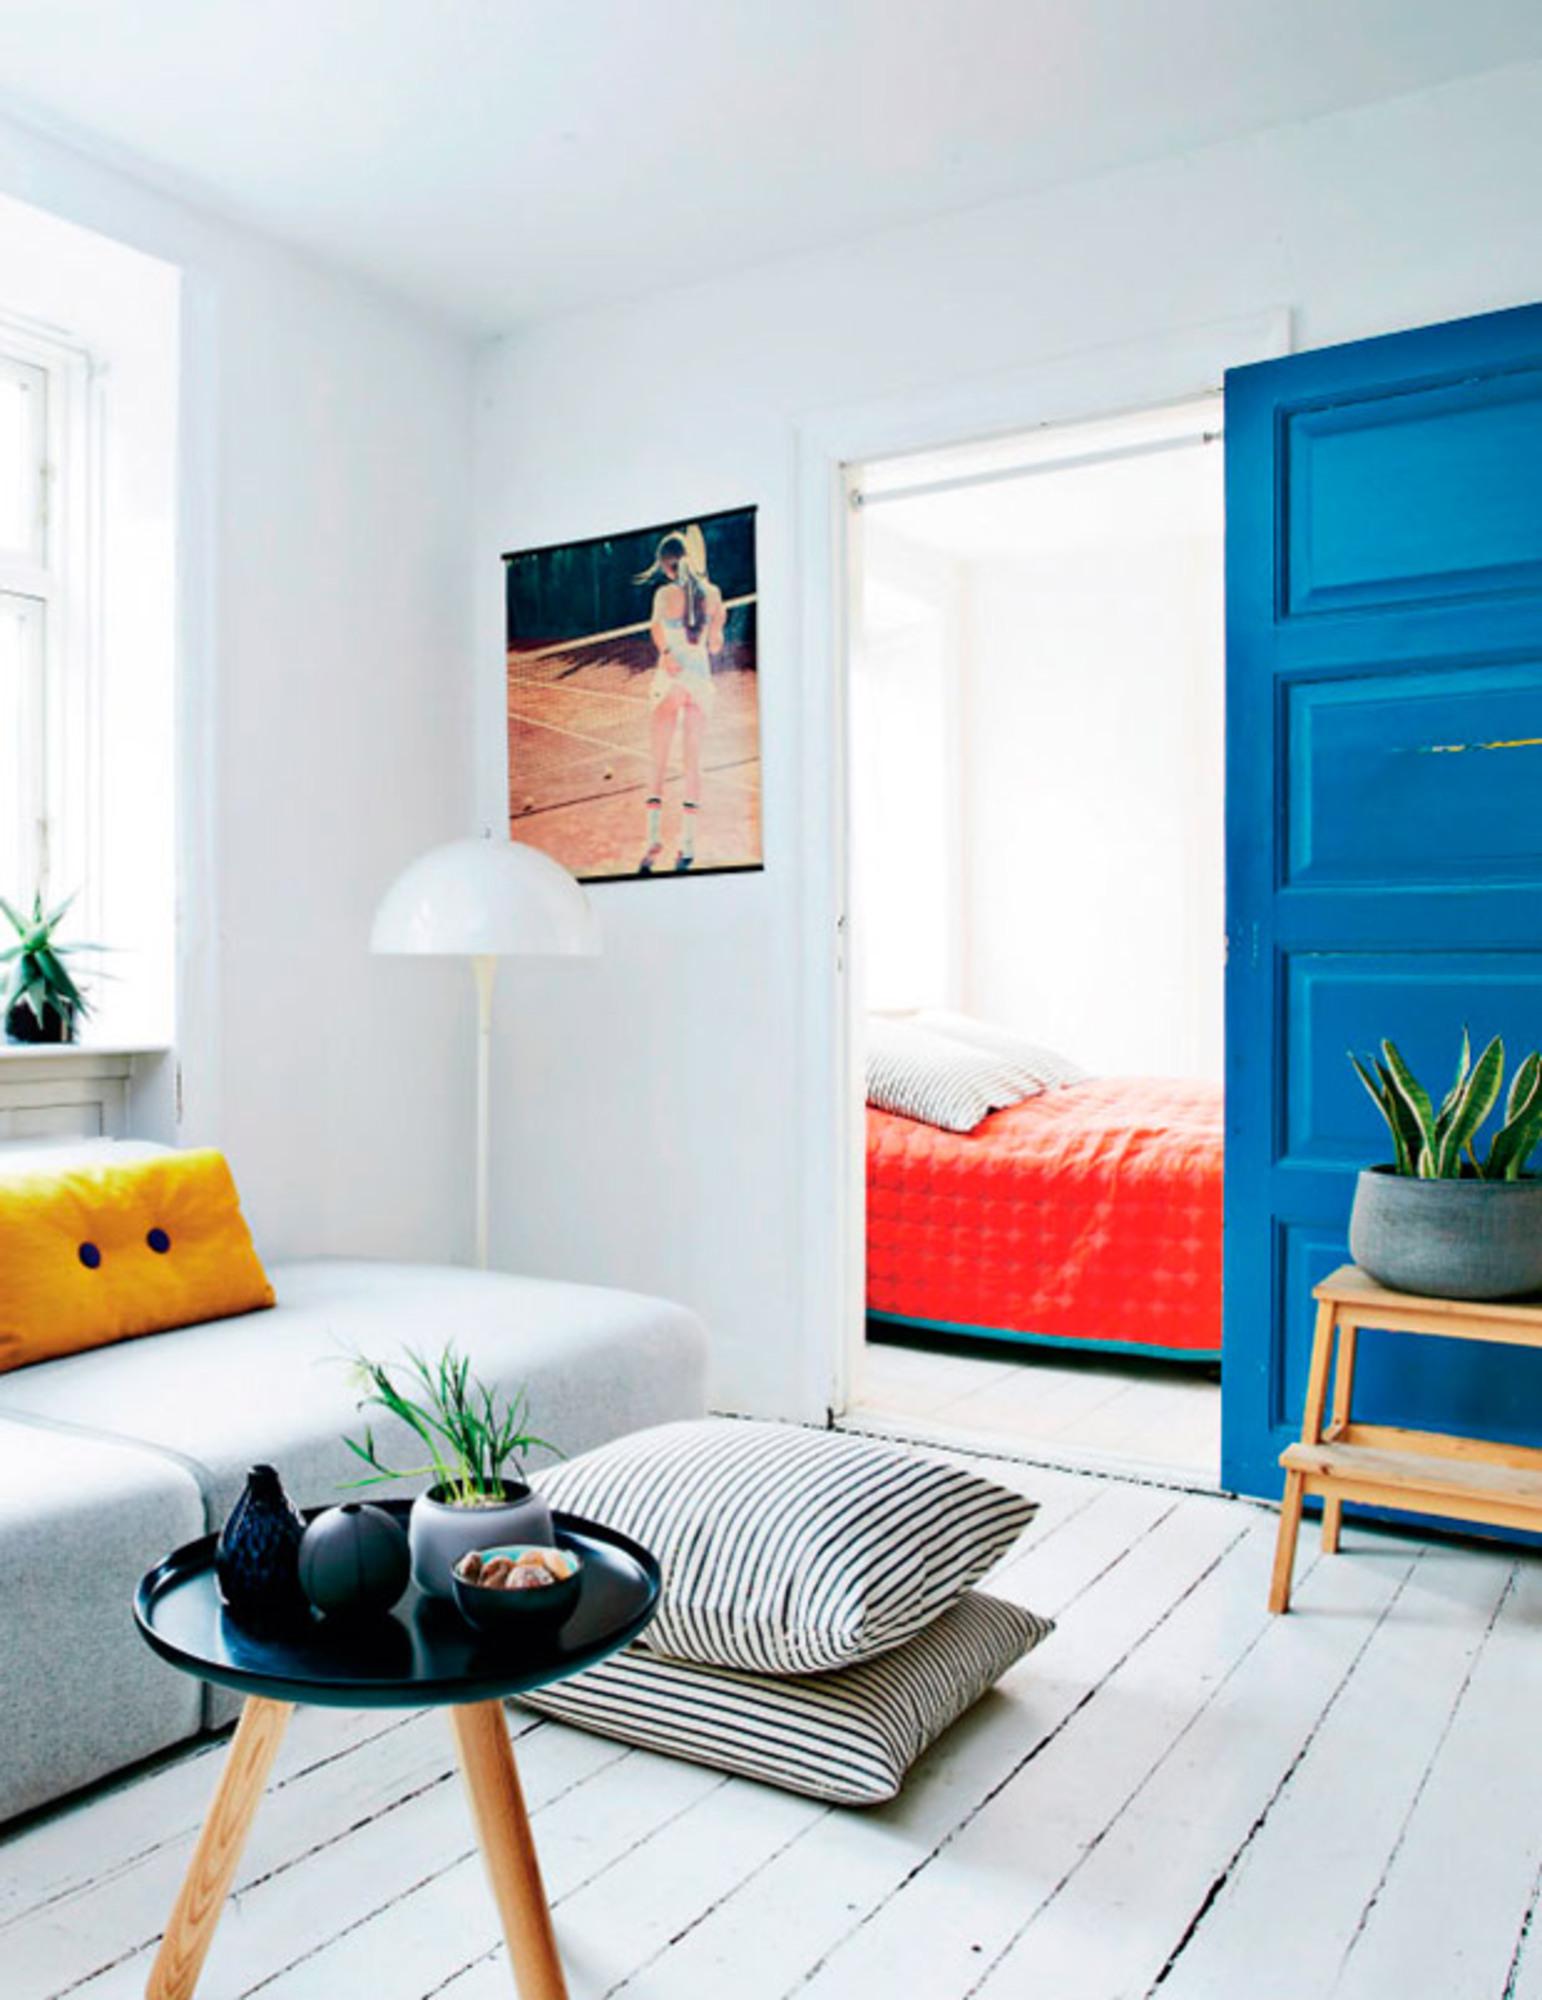 Idé til indretningen   en farvet dør